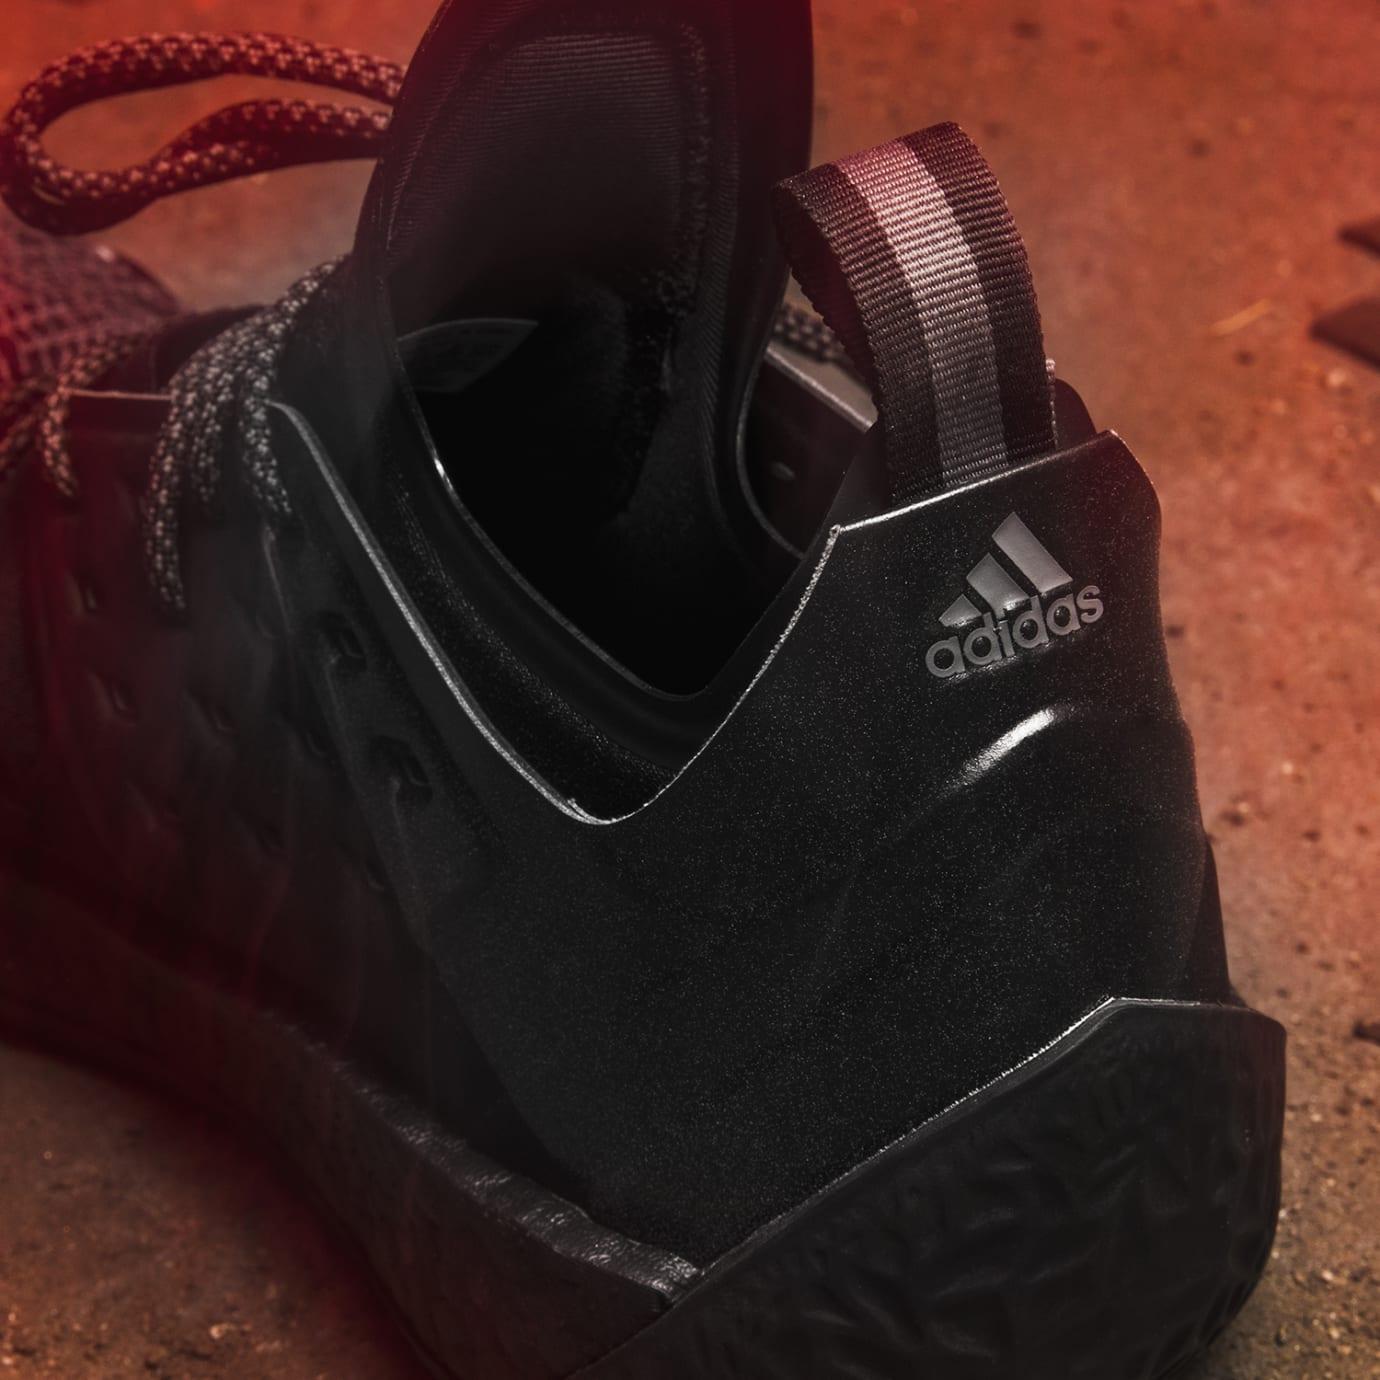 a5b0372e4aac Adidas Harden Vol. 2 Nightmare Release Date F34361 Heel